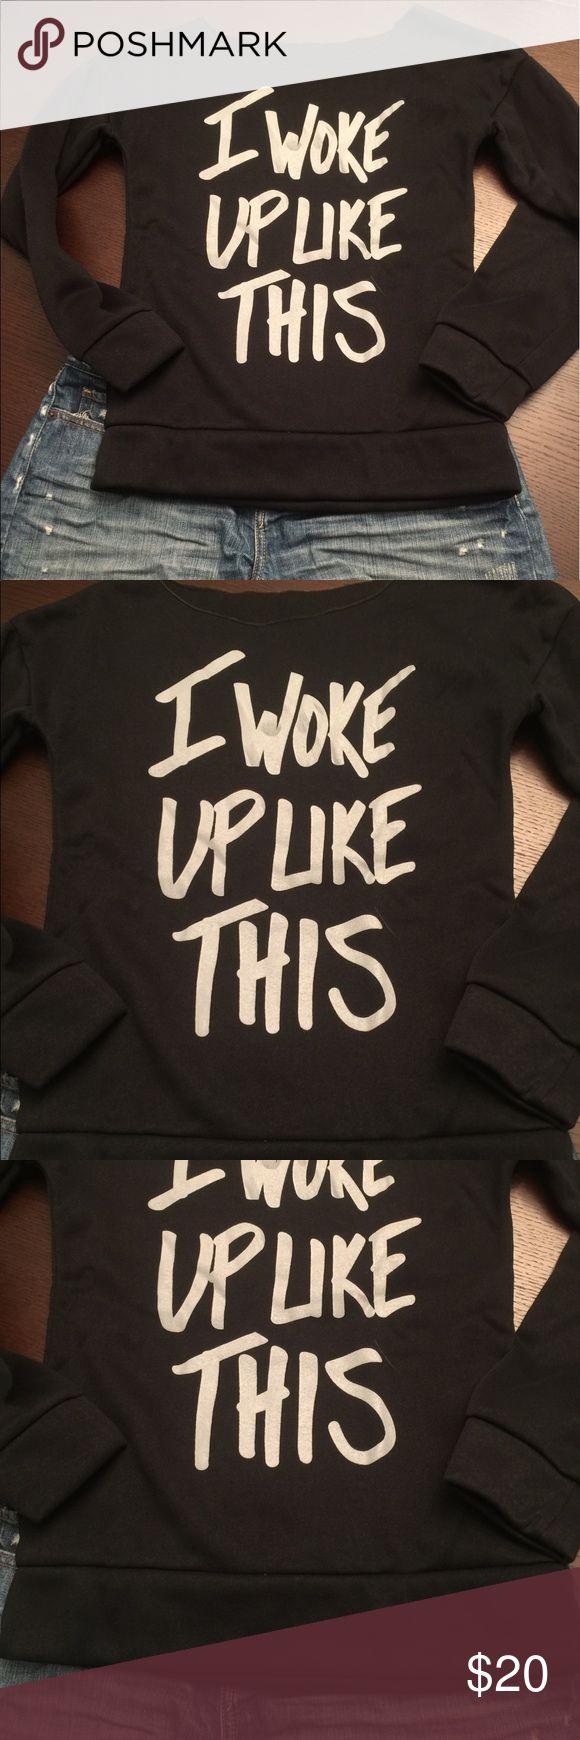 Sweatshirt- I Woke Up Like This Brand new black sweatshirt. Light weight. Size small Tops Sweatshirts & Hoodies